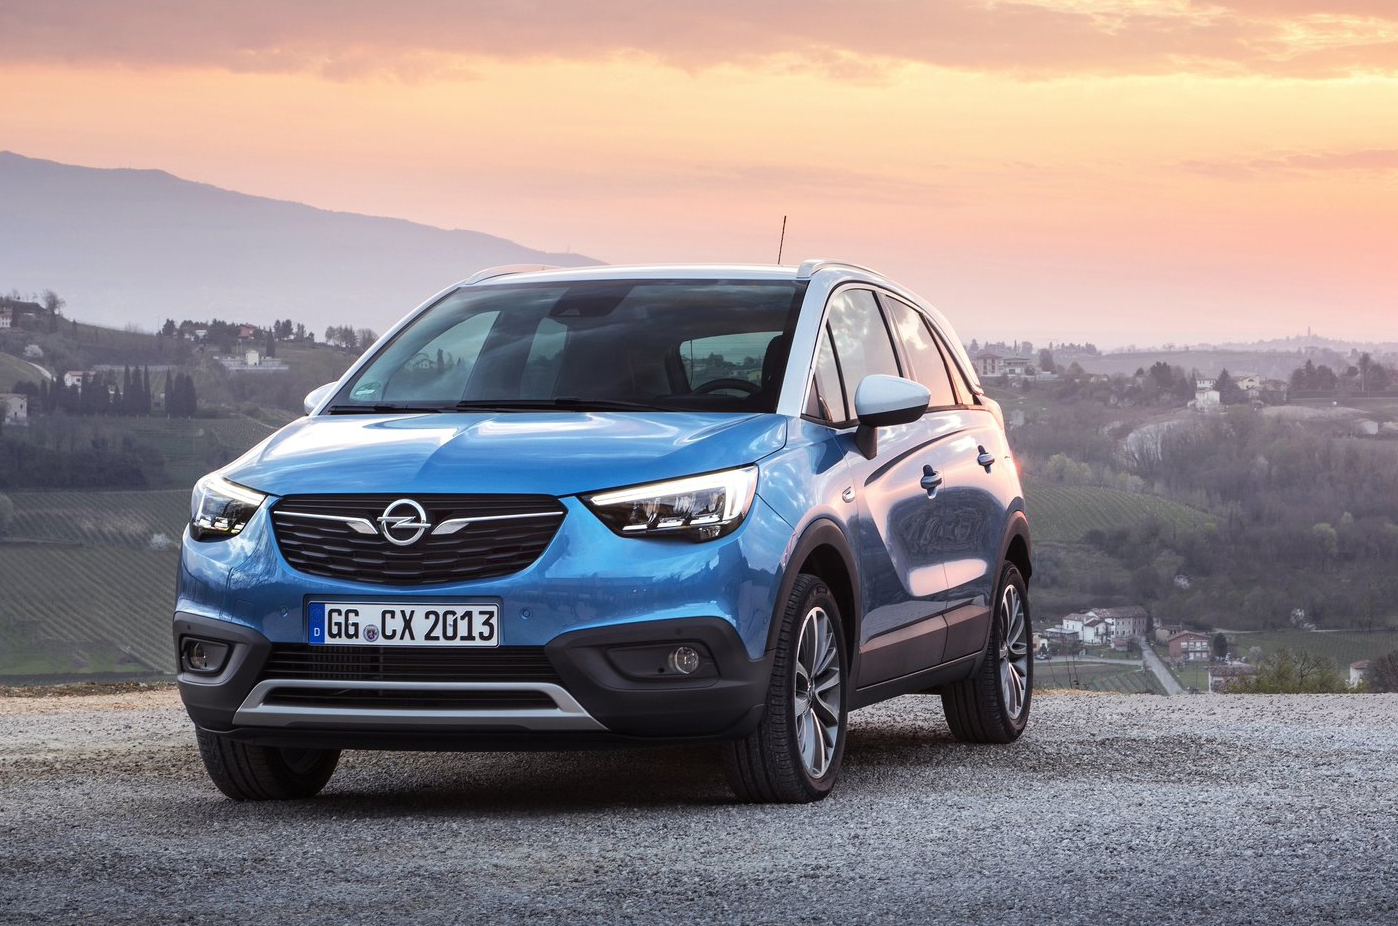 Nu sænker Opel endnu engang priserne | Bilmagasinet.dk